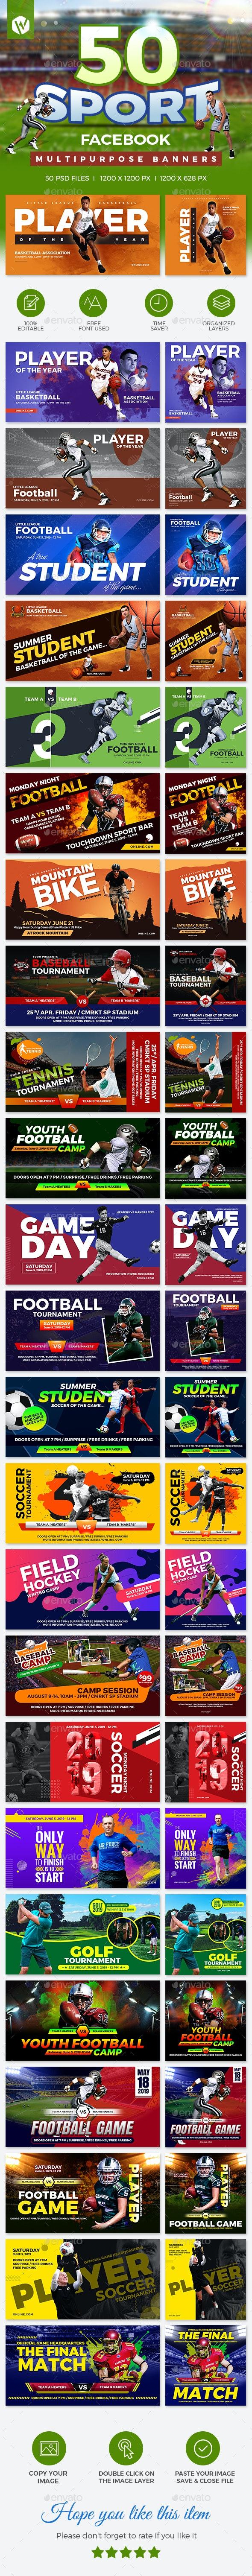 50 Facebook Sports Banners - Social Media Web Elements